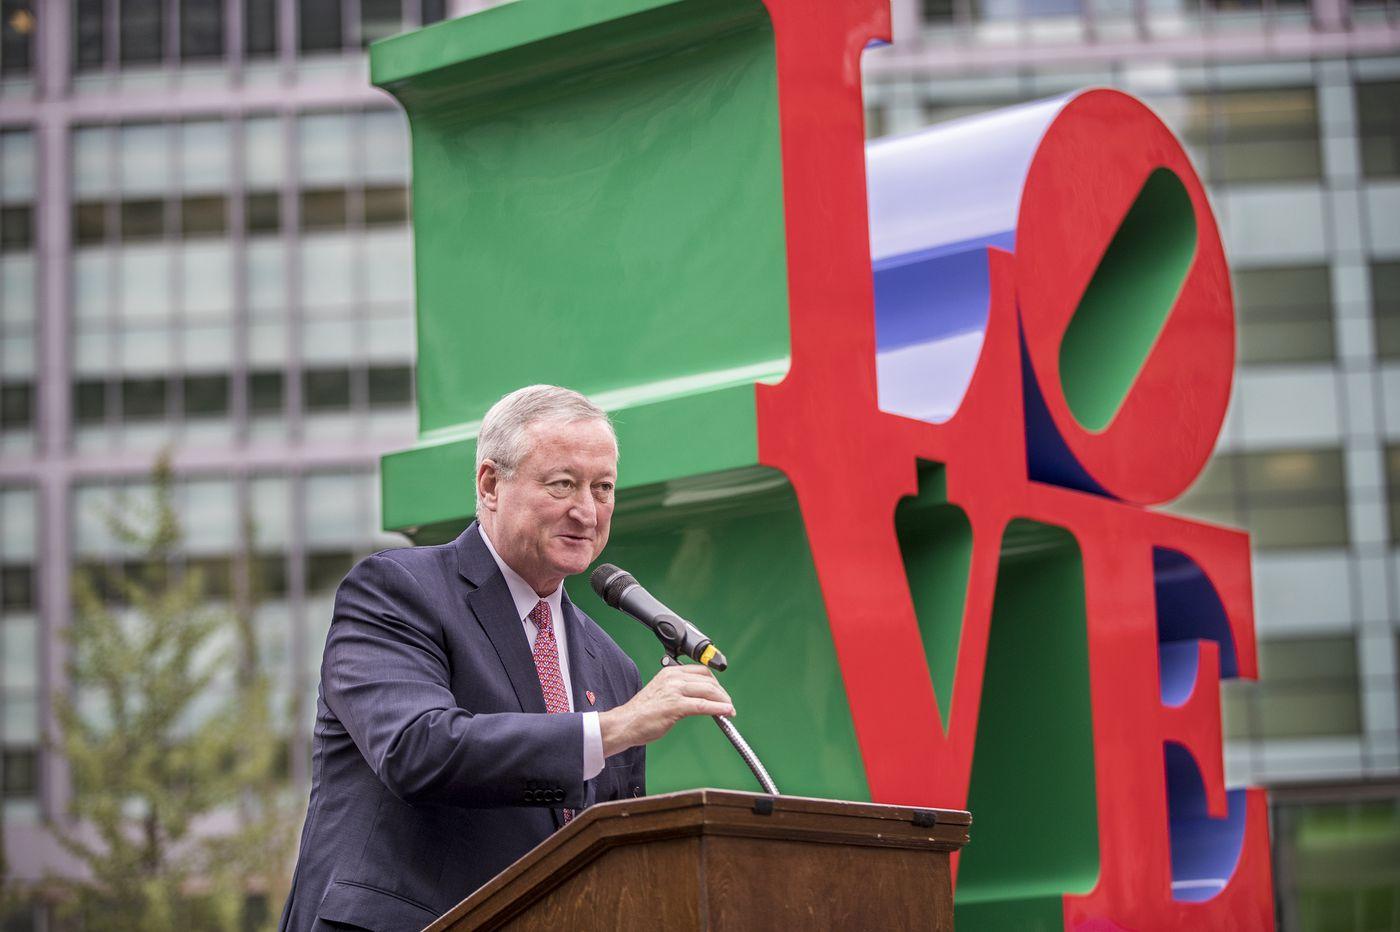 Judge rules for Philadelphia in 'Sanctuary City' case